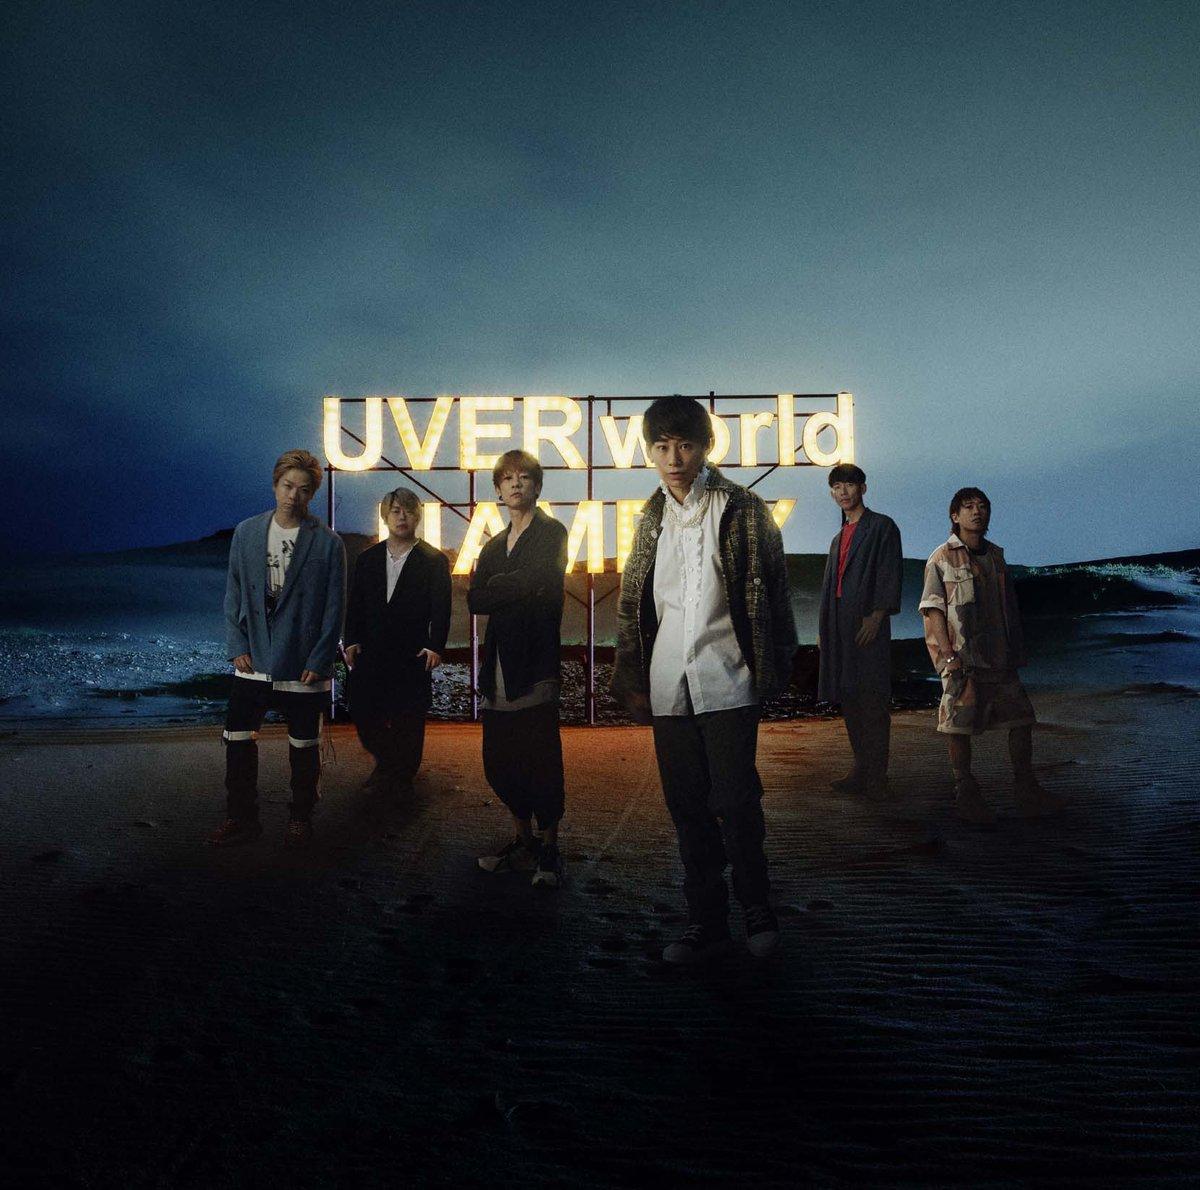 『UVERworld - NAMELY』収録の『NAMELY』ジャケット